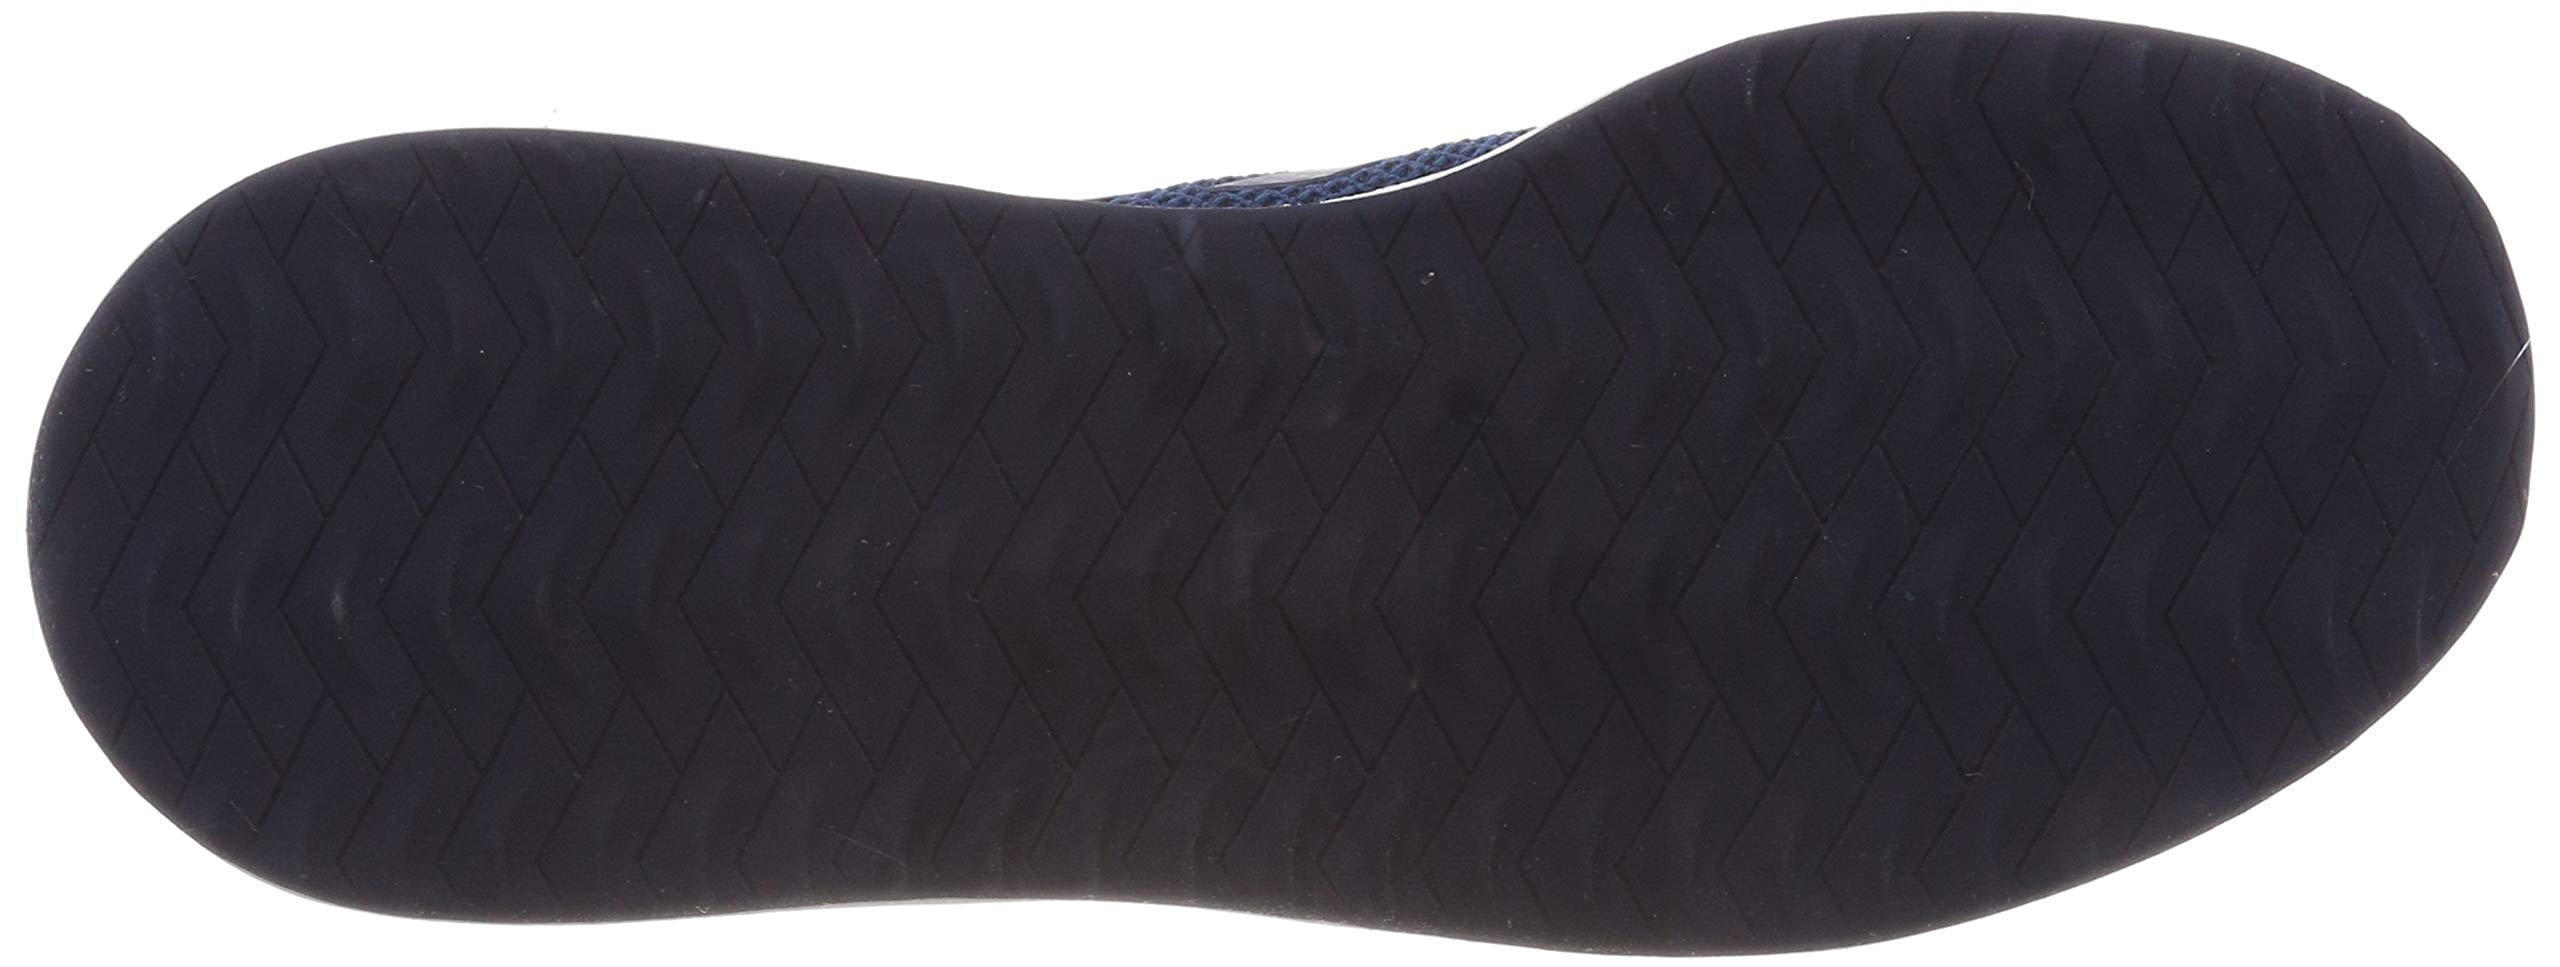 adidas Run70s, Scarpe da Running Uomo 8 spesavip